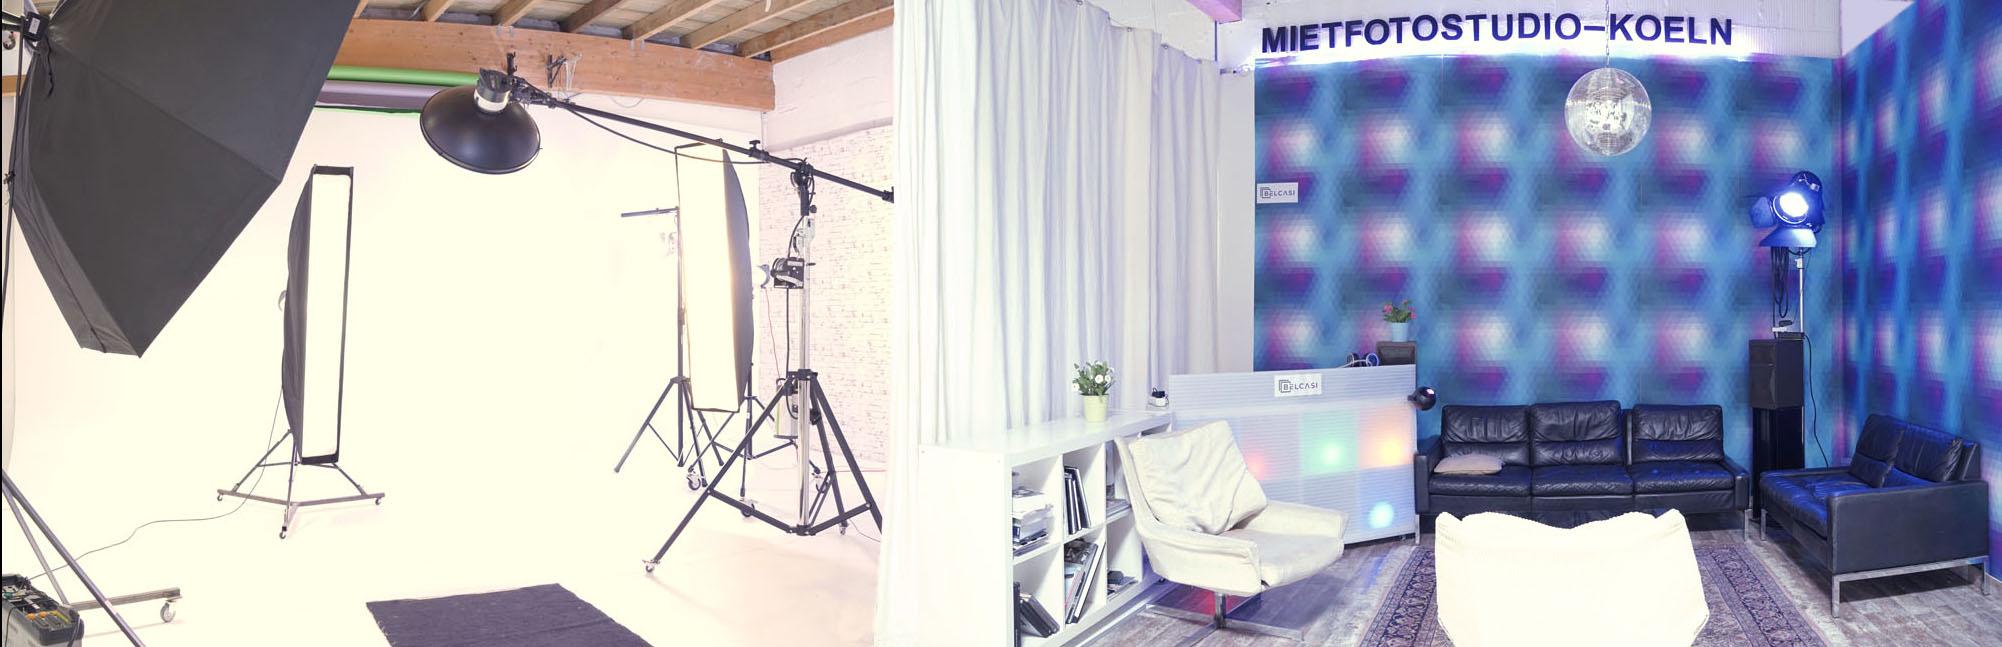 Video- & Fotostudio in Köln